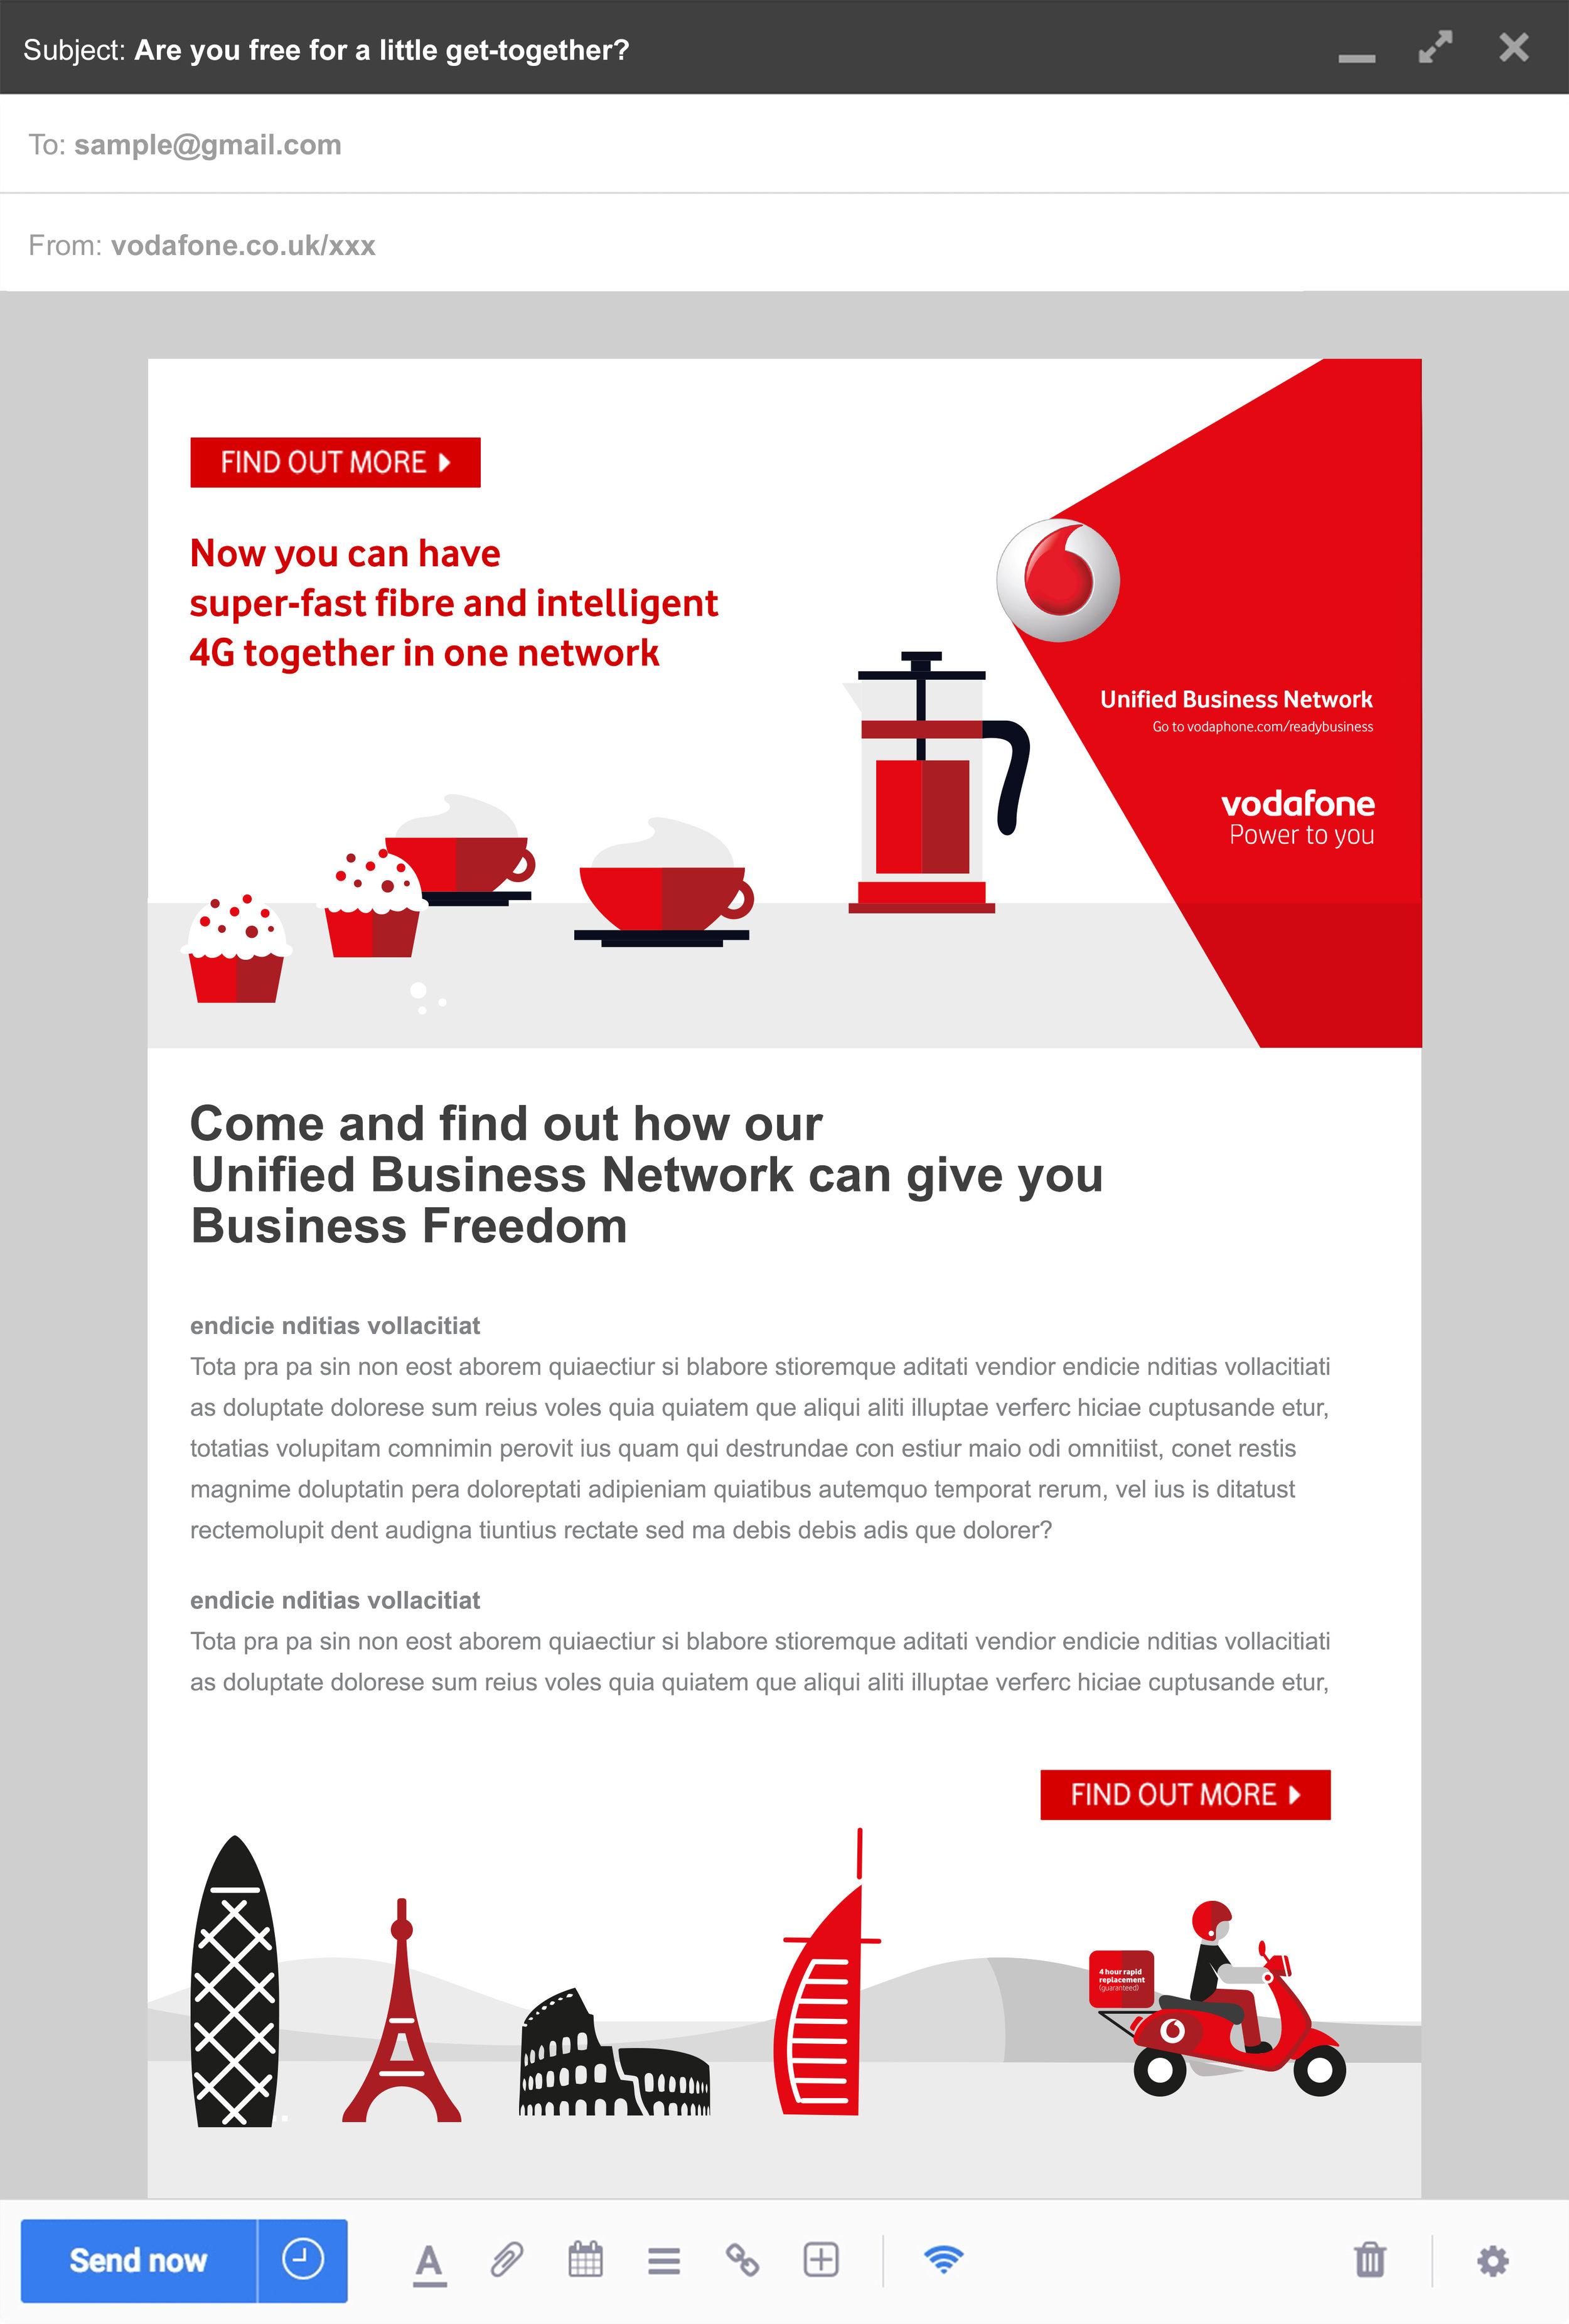 vodafone email template_get together.jpg